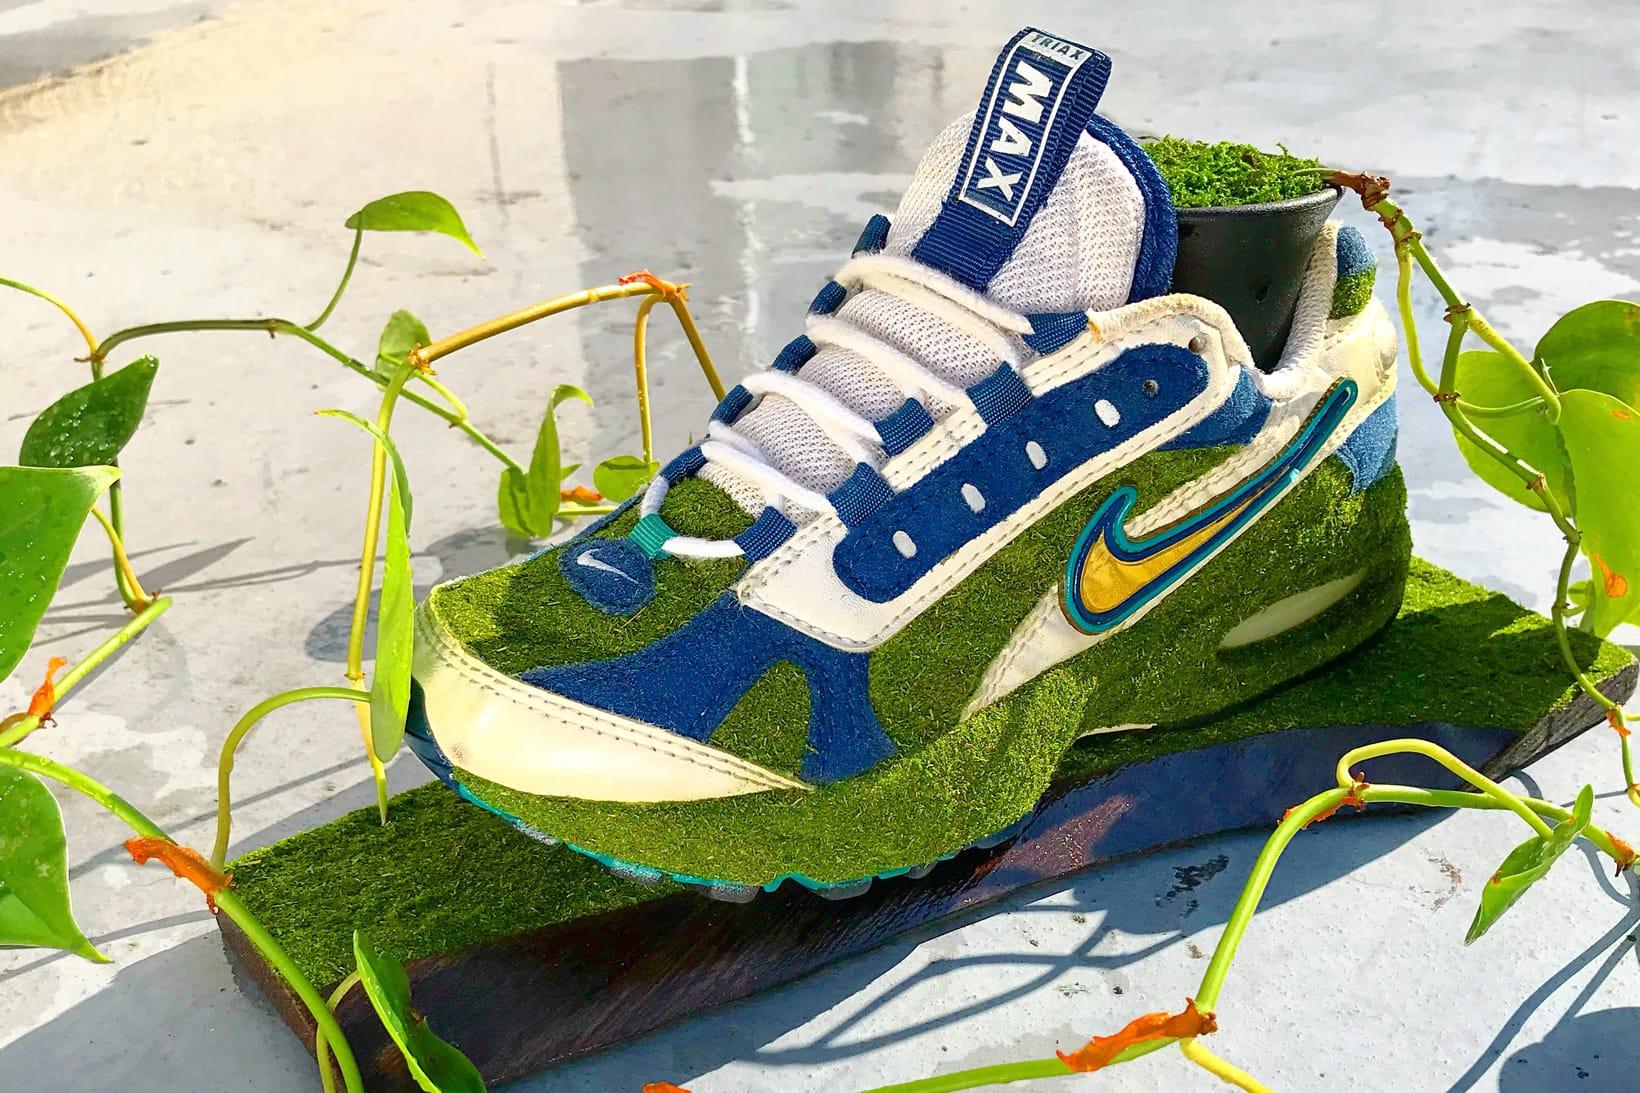 Shoetree 將于東京舉辦全新球鞋盆栽展覽